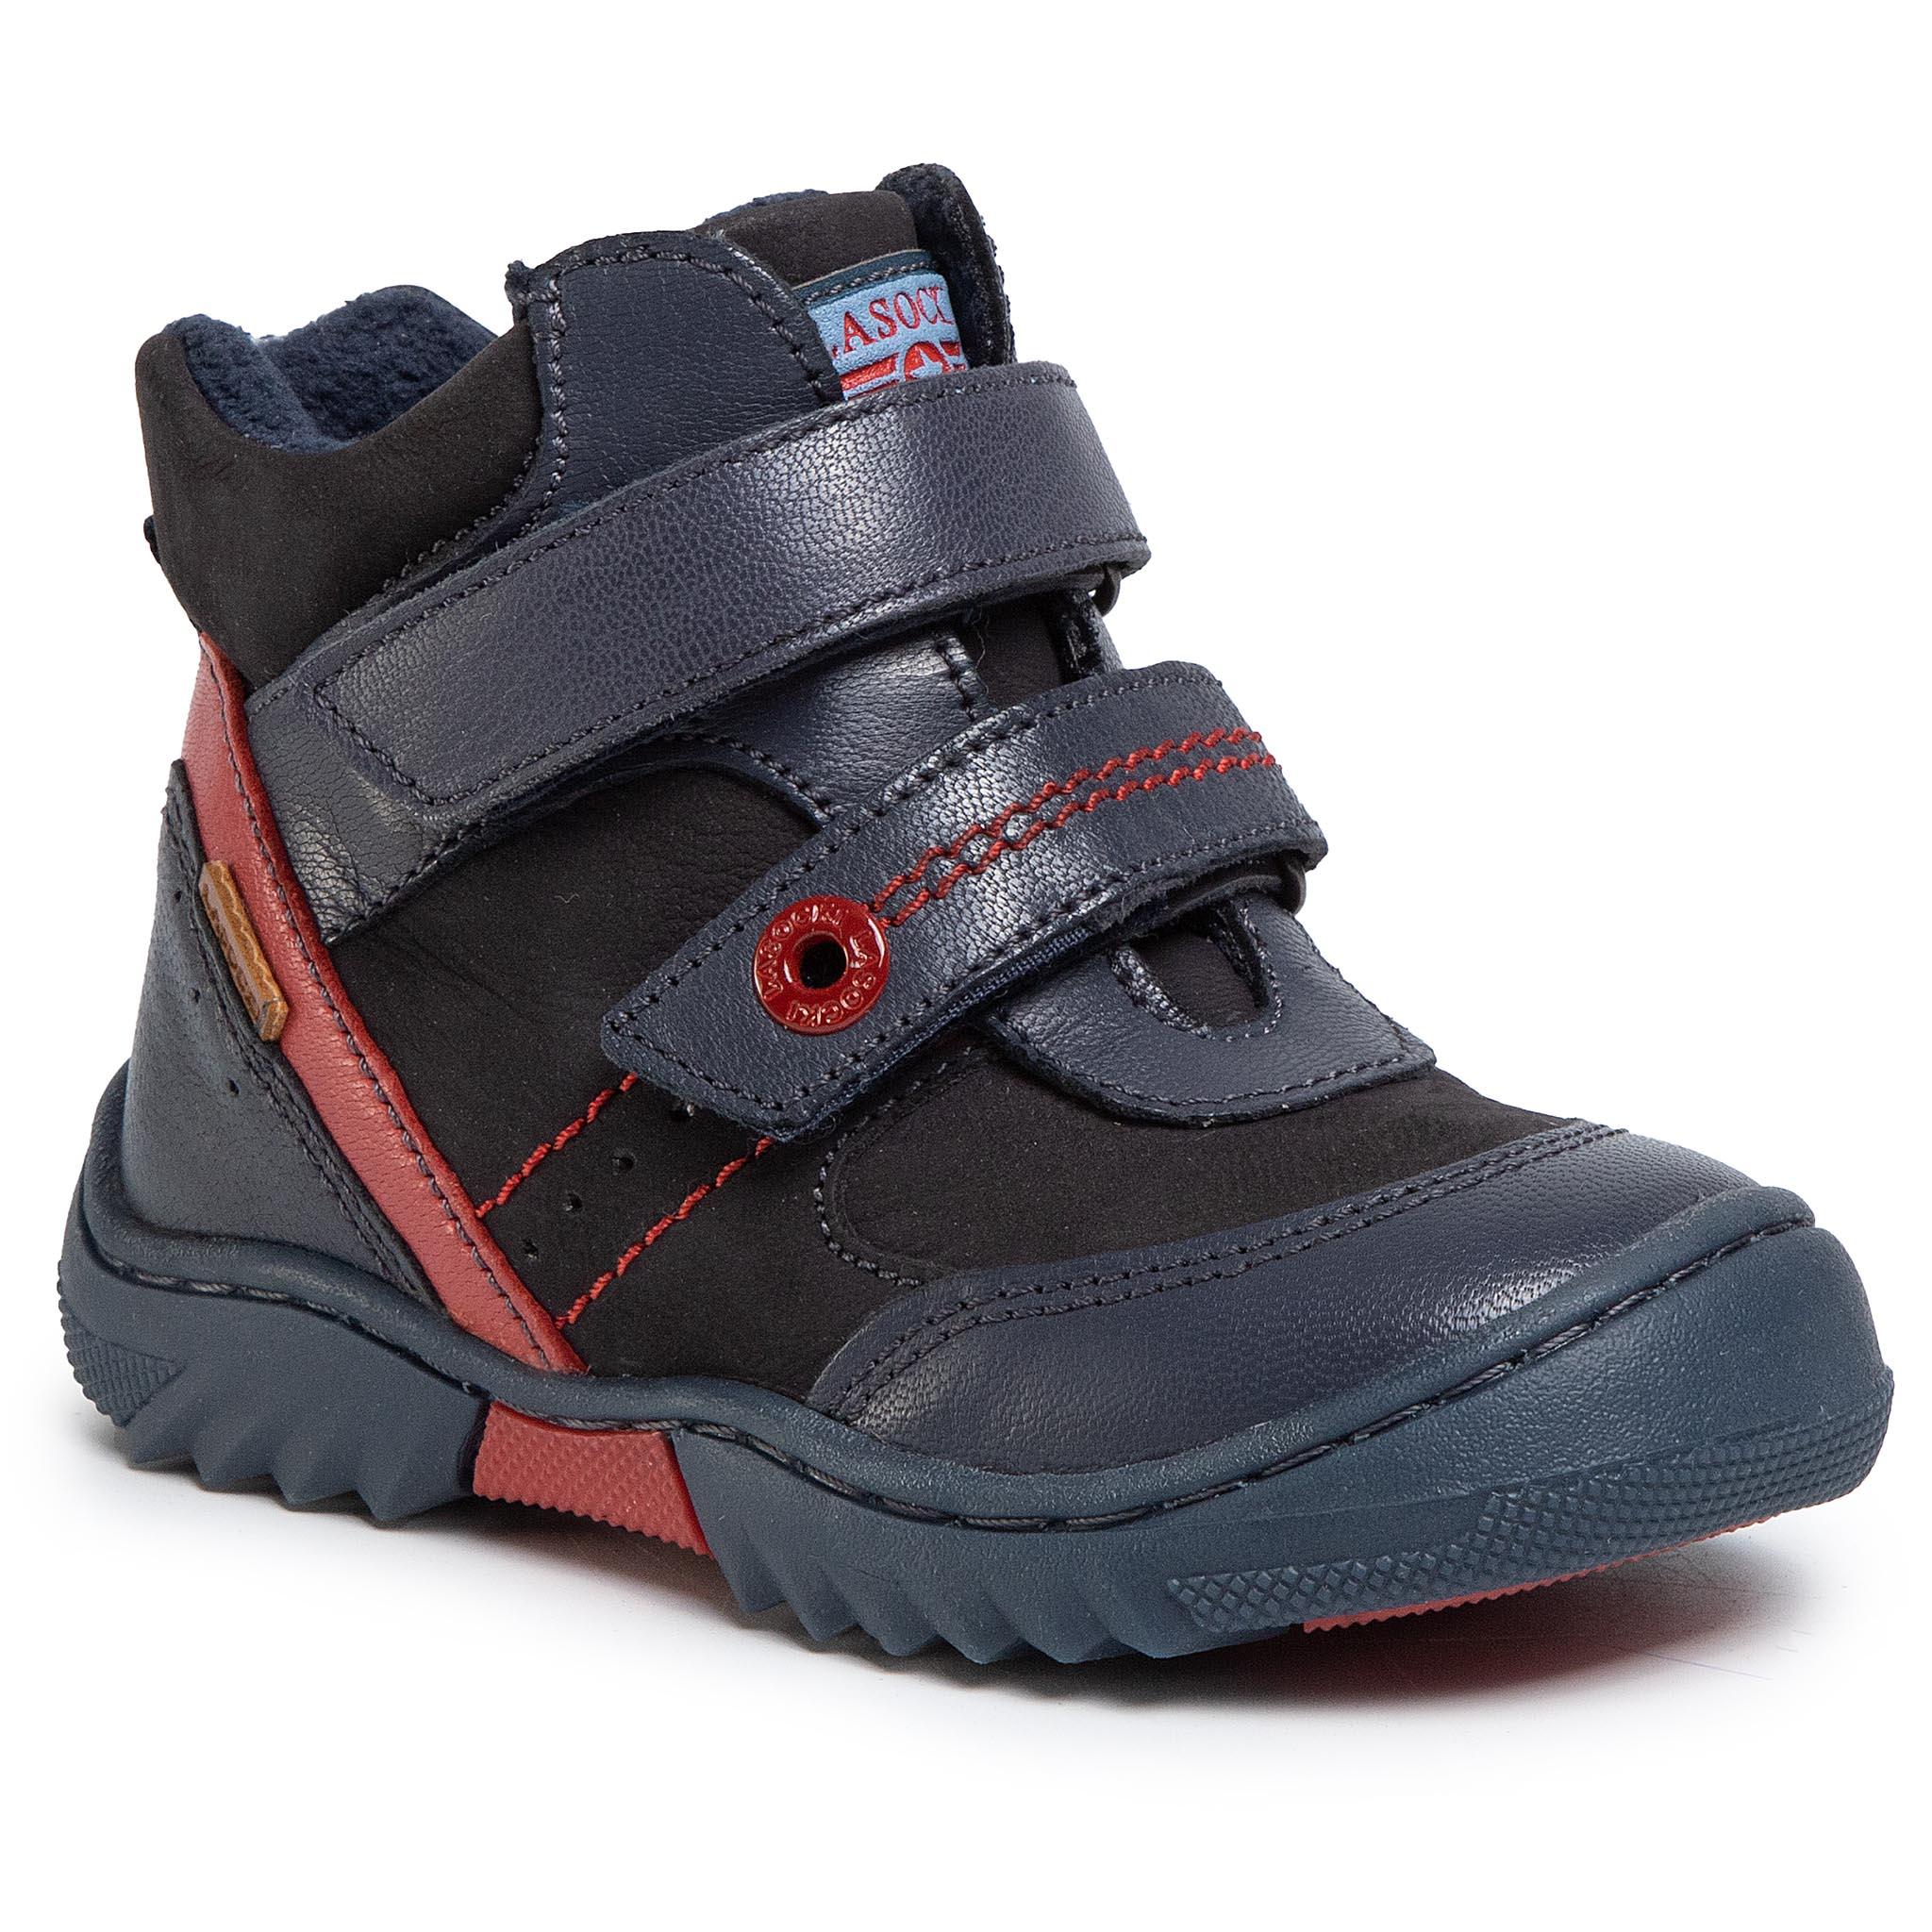 Outdoorová obuv LASOCKI KIDS - CI12-FLICK-02 Cobalt Blue